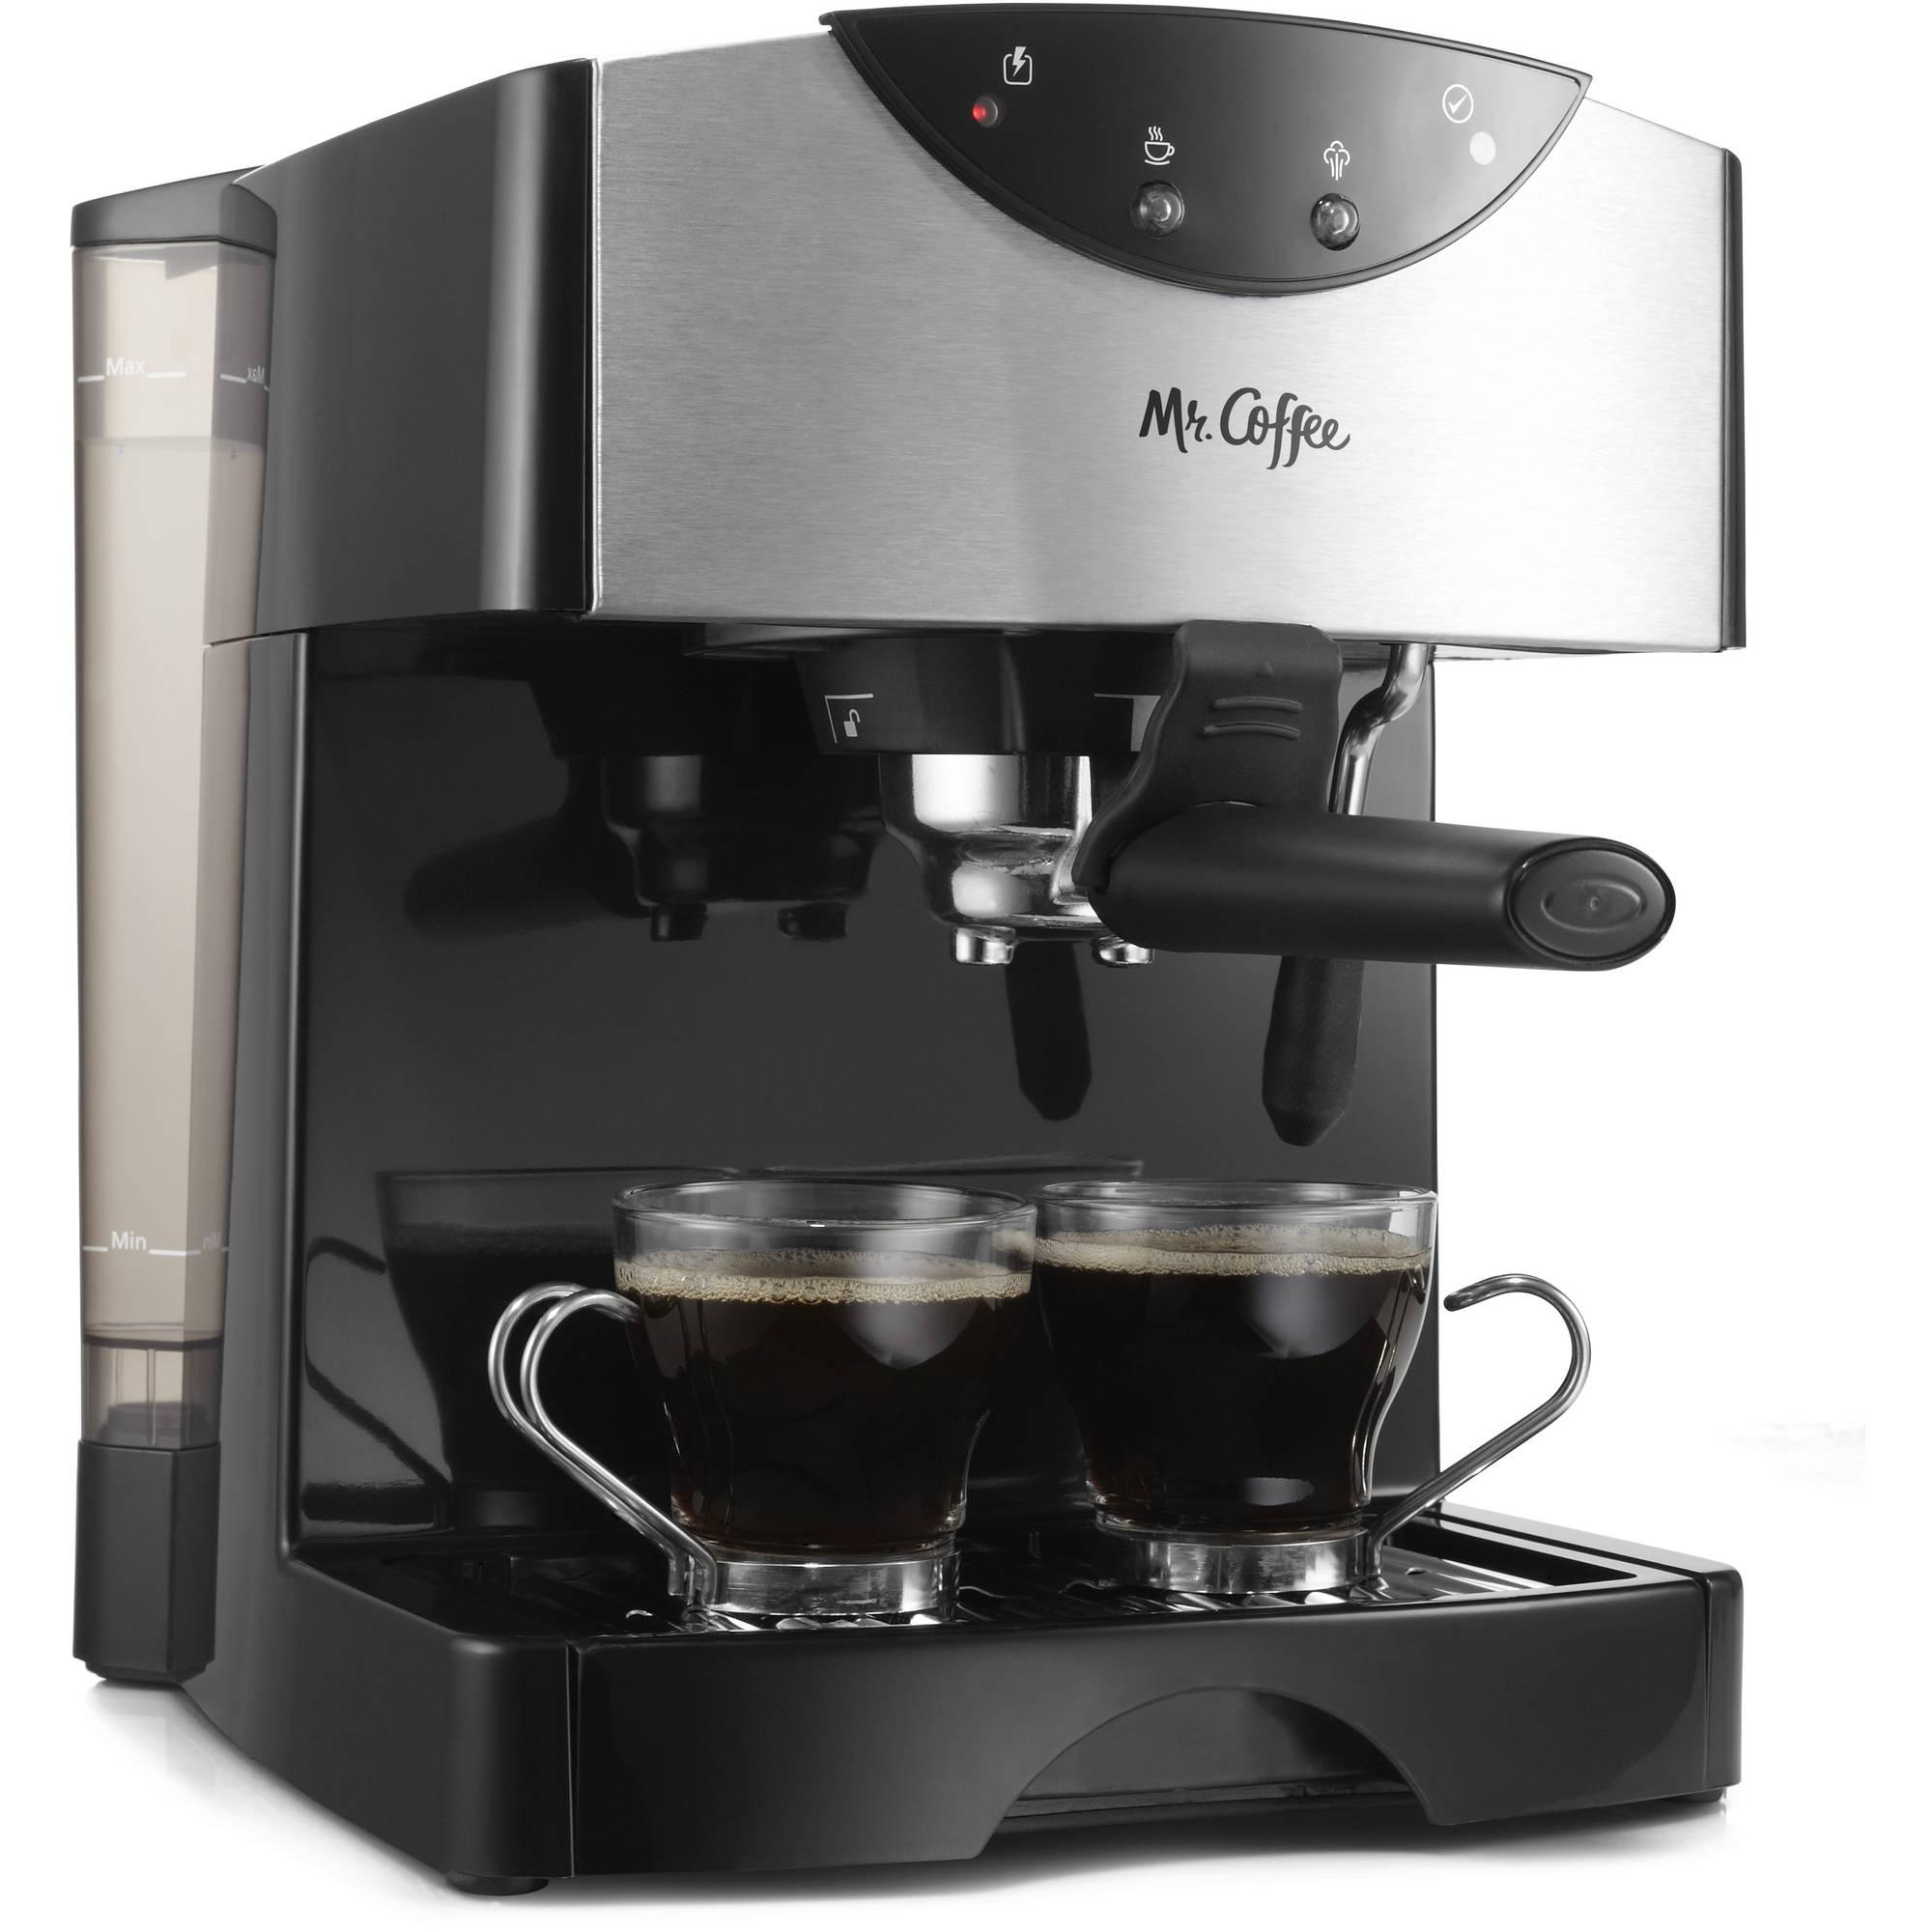 Mr. Coffee Pump Espresso Machine, ECMP50